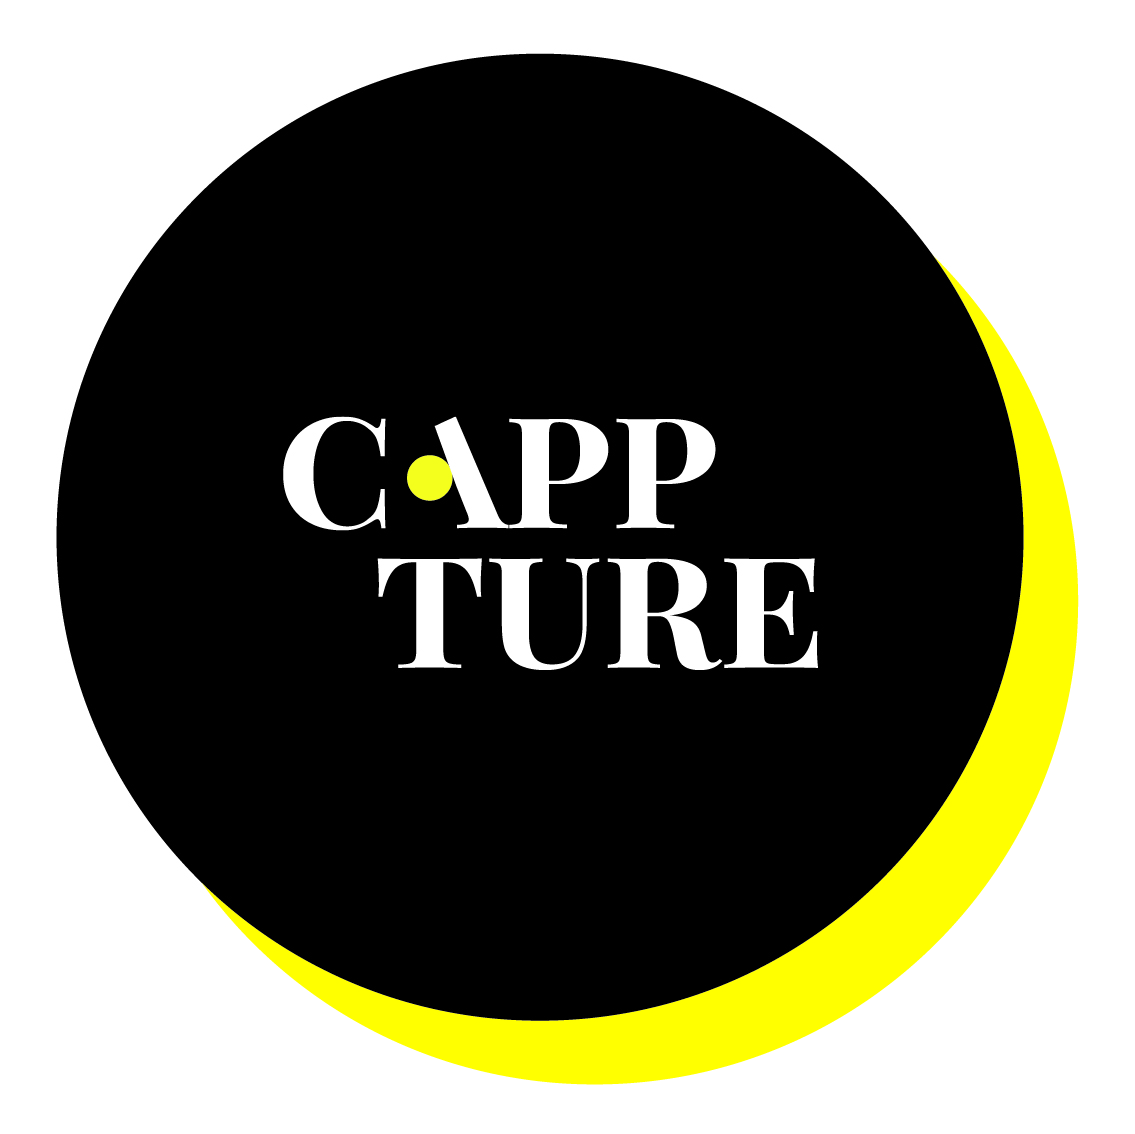 CAPP I ture